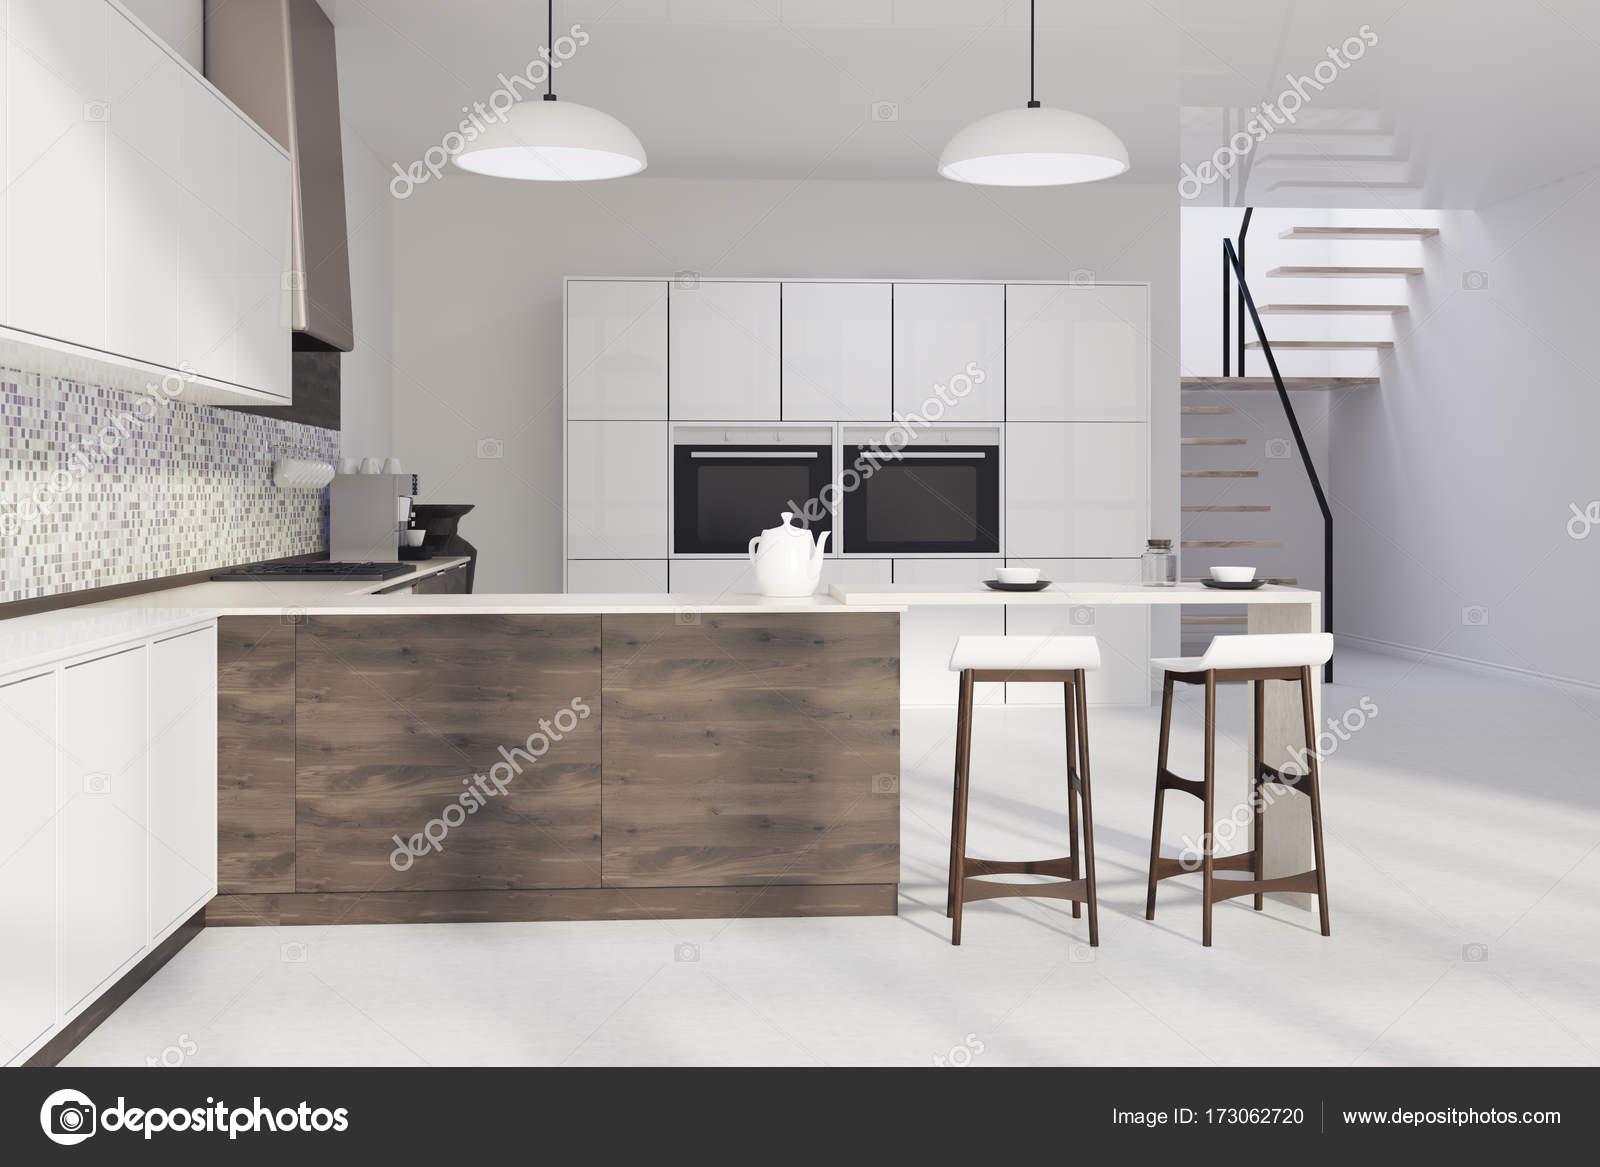 Keuken Houten Bar : Mozaïek keuken donker houten bar u2014 stockfoto © denisismagilov